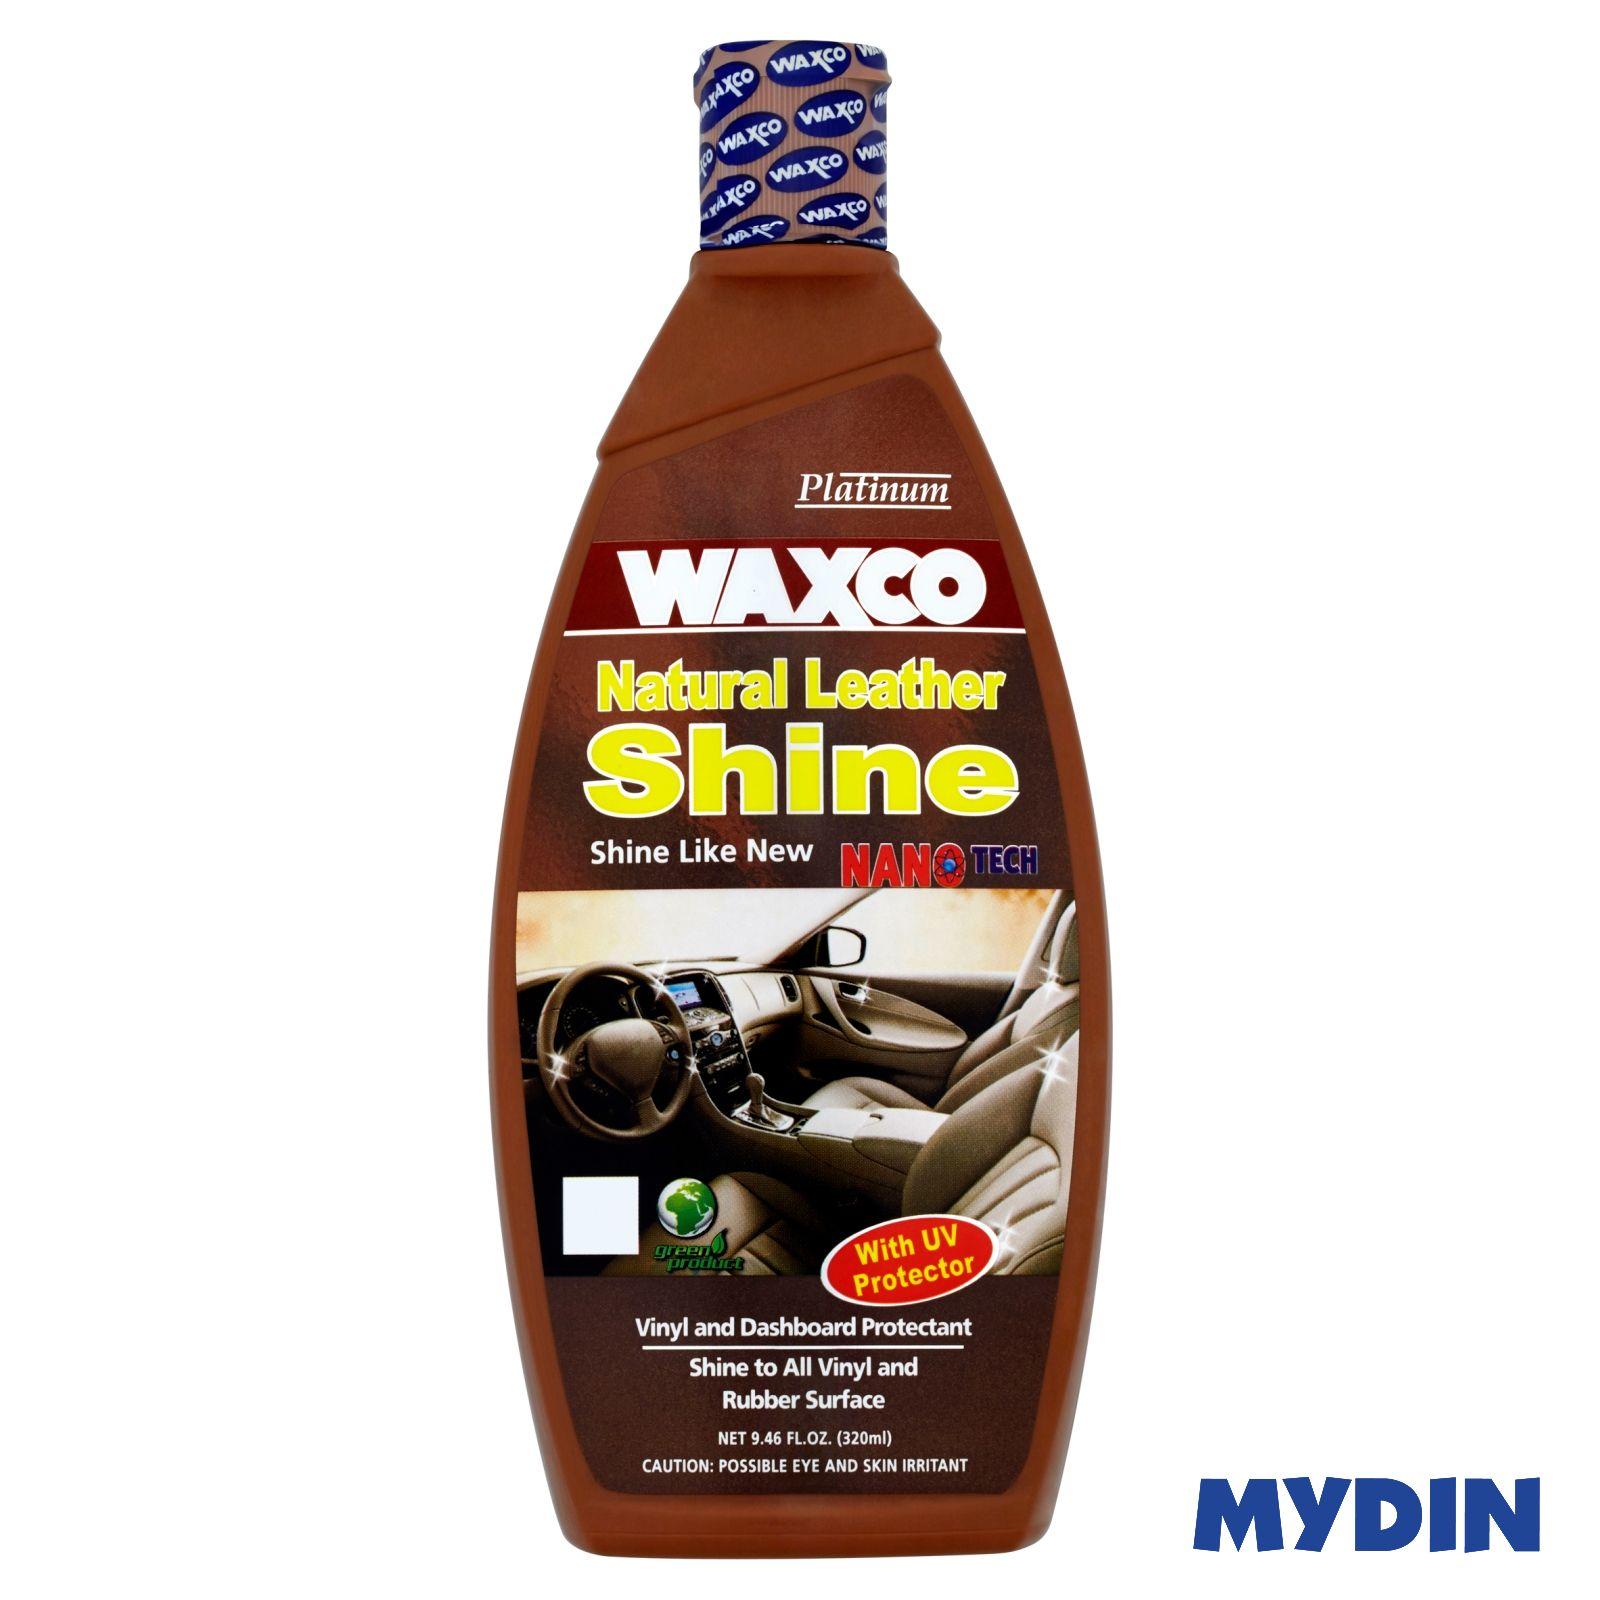 Waxco Platinum Natural Leather Shine (320ml)